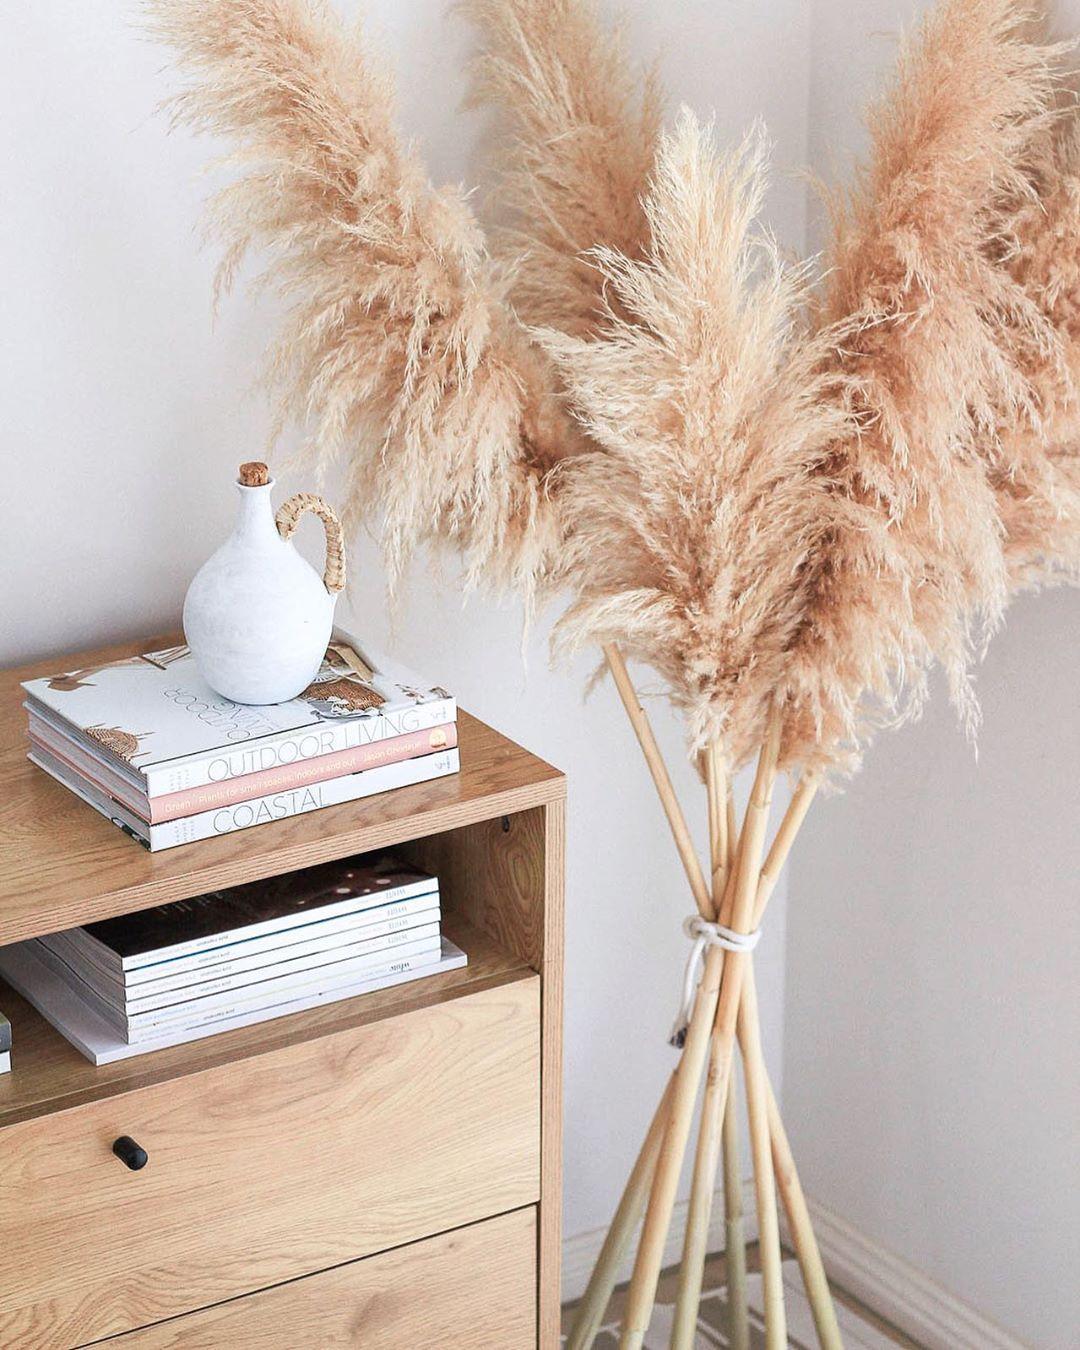 How to display Pampas Grass | Simple decor, Pampas grass, Pampas